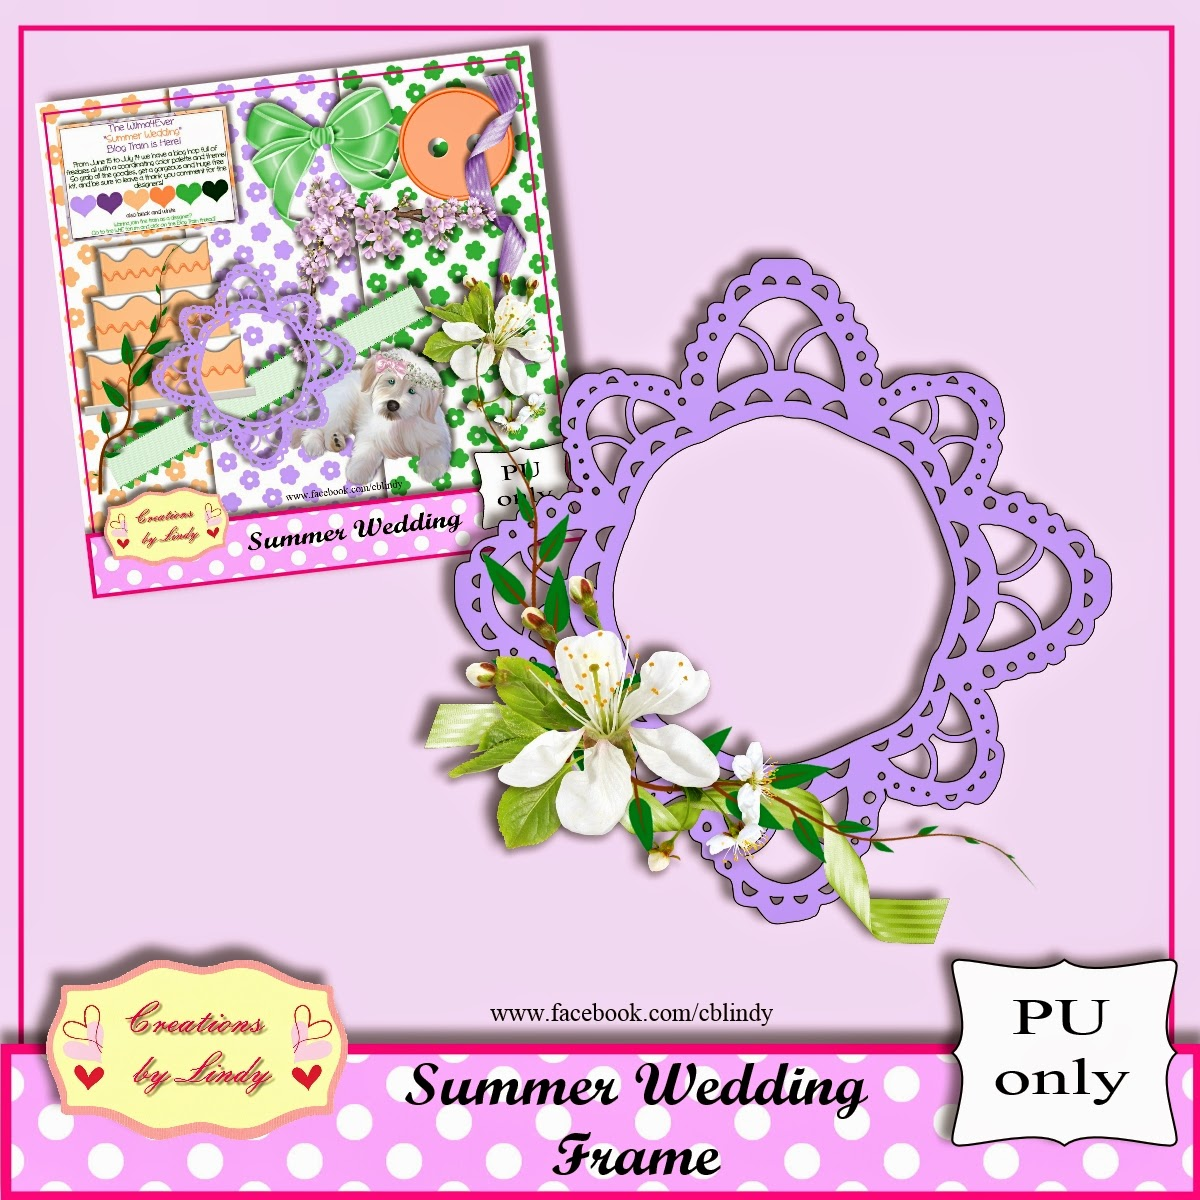 http://4.bp.blogspot.com/-_bHtBoJThkU/U6vCk7tb-VI/AAAAAAAAARw/IMm0R-i28e8/s1600/cbl_summer_wedding_frame_image.jpg